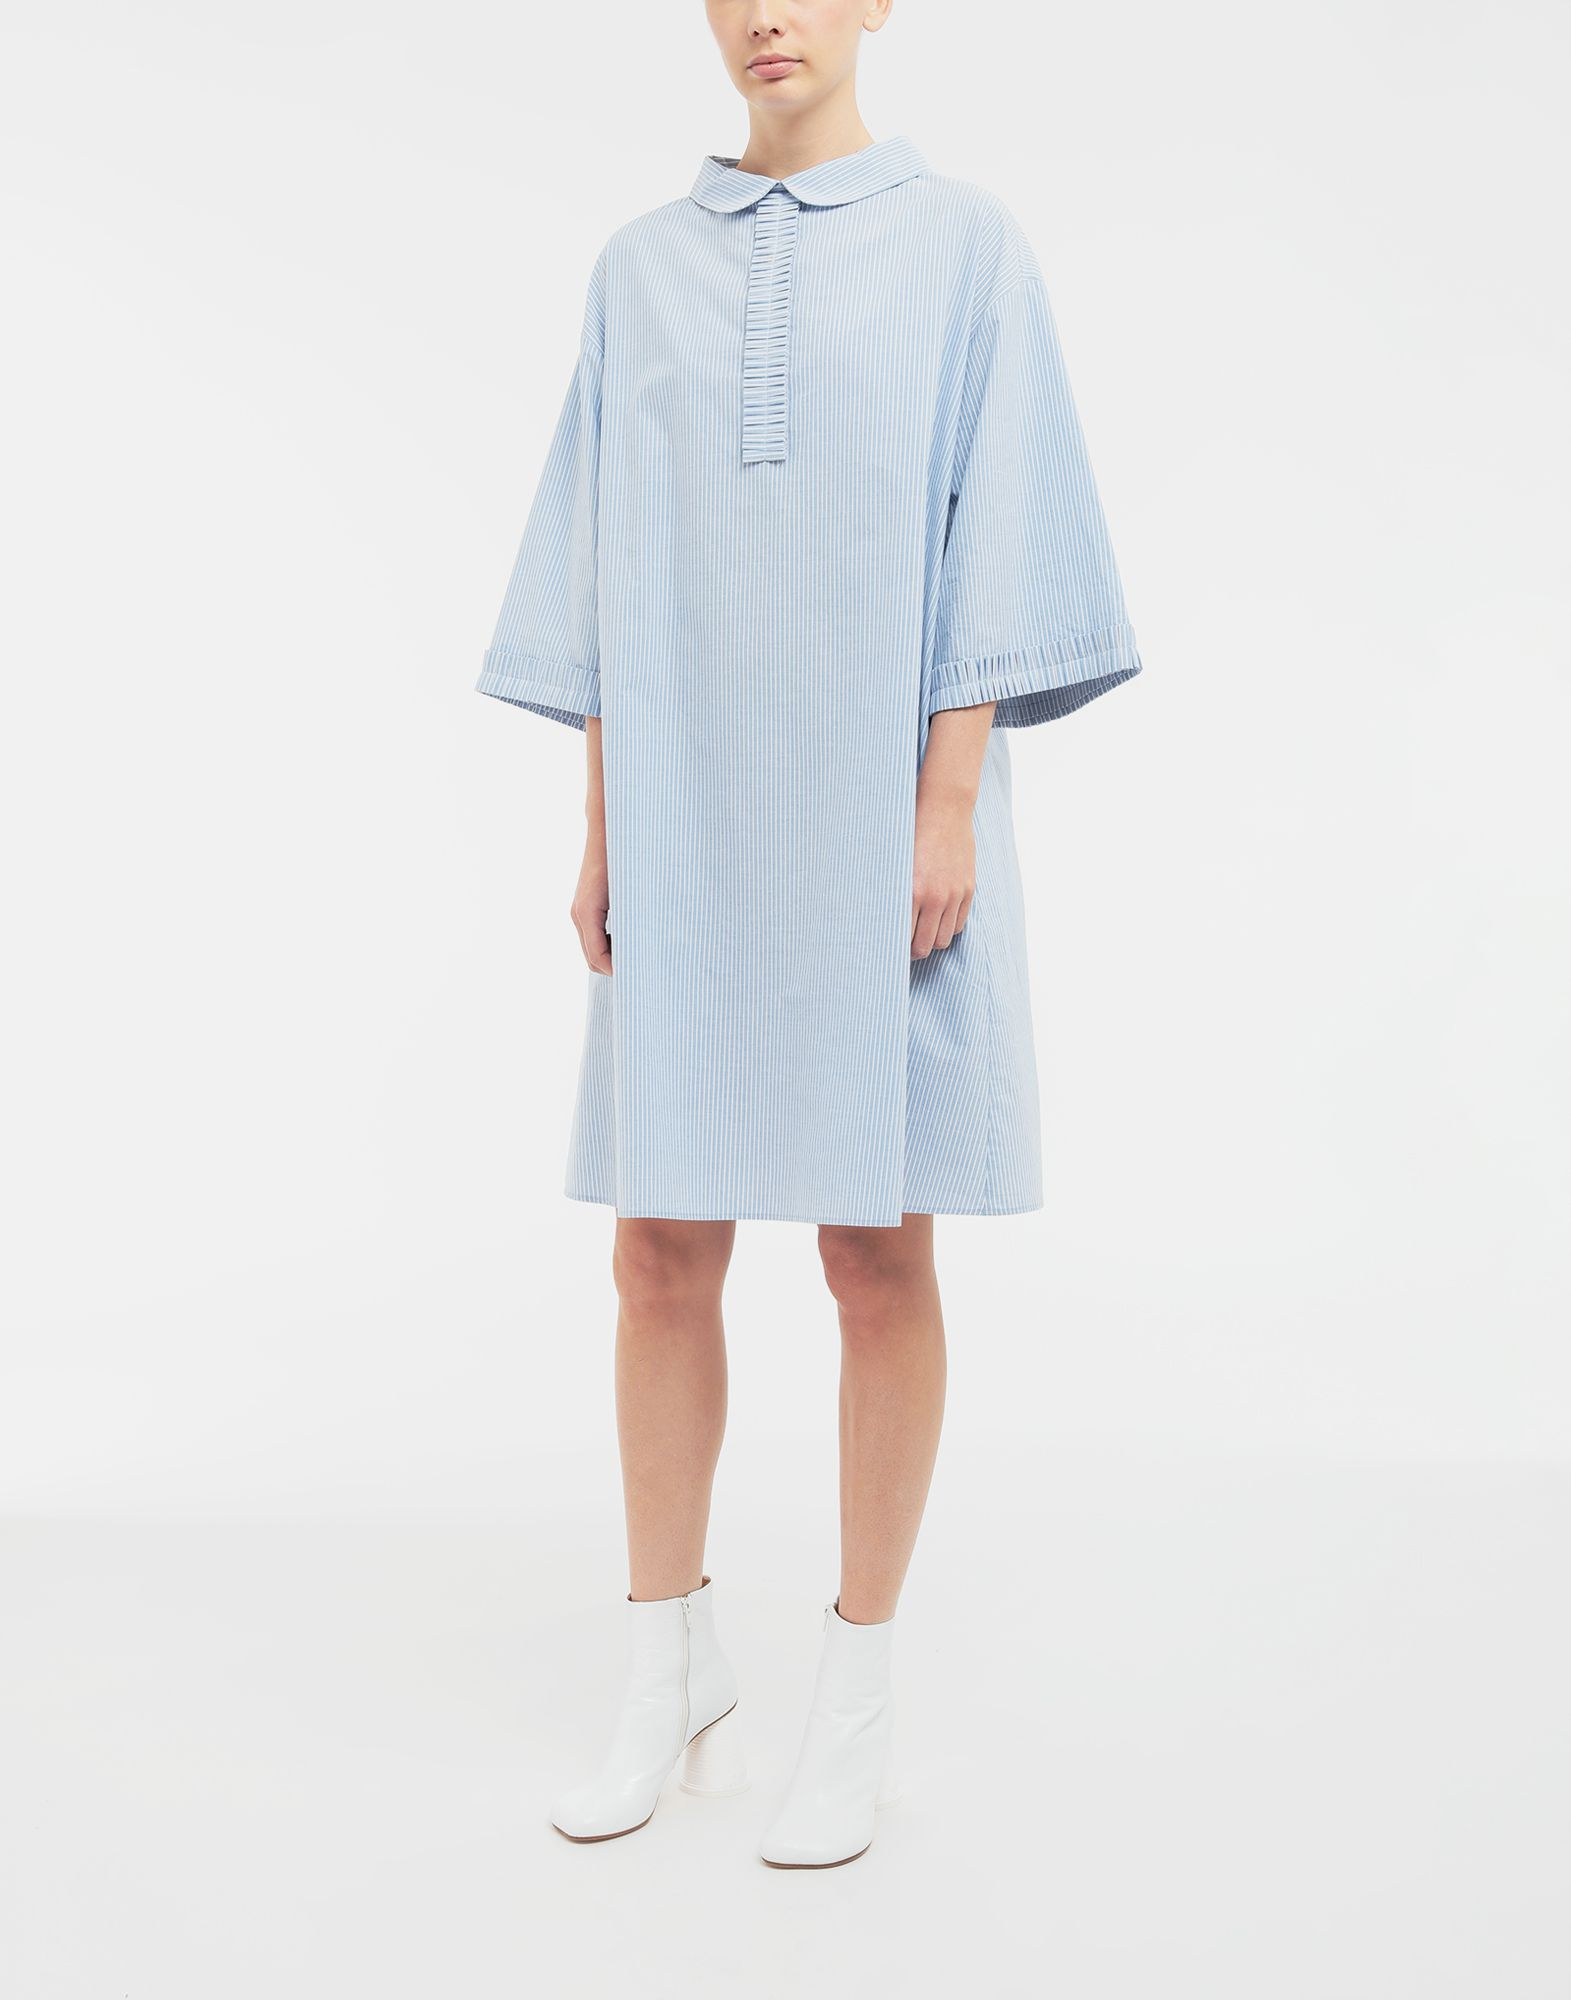 MM6 MAISON MARGIELA School uniform midi shirt dress 3/4 length dress Woman r